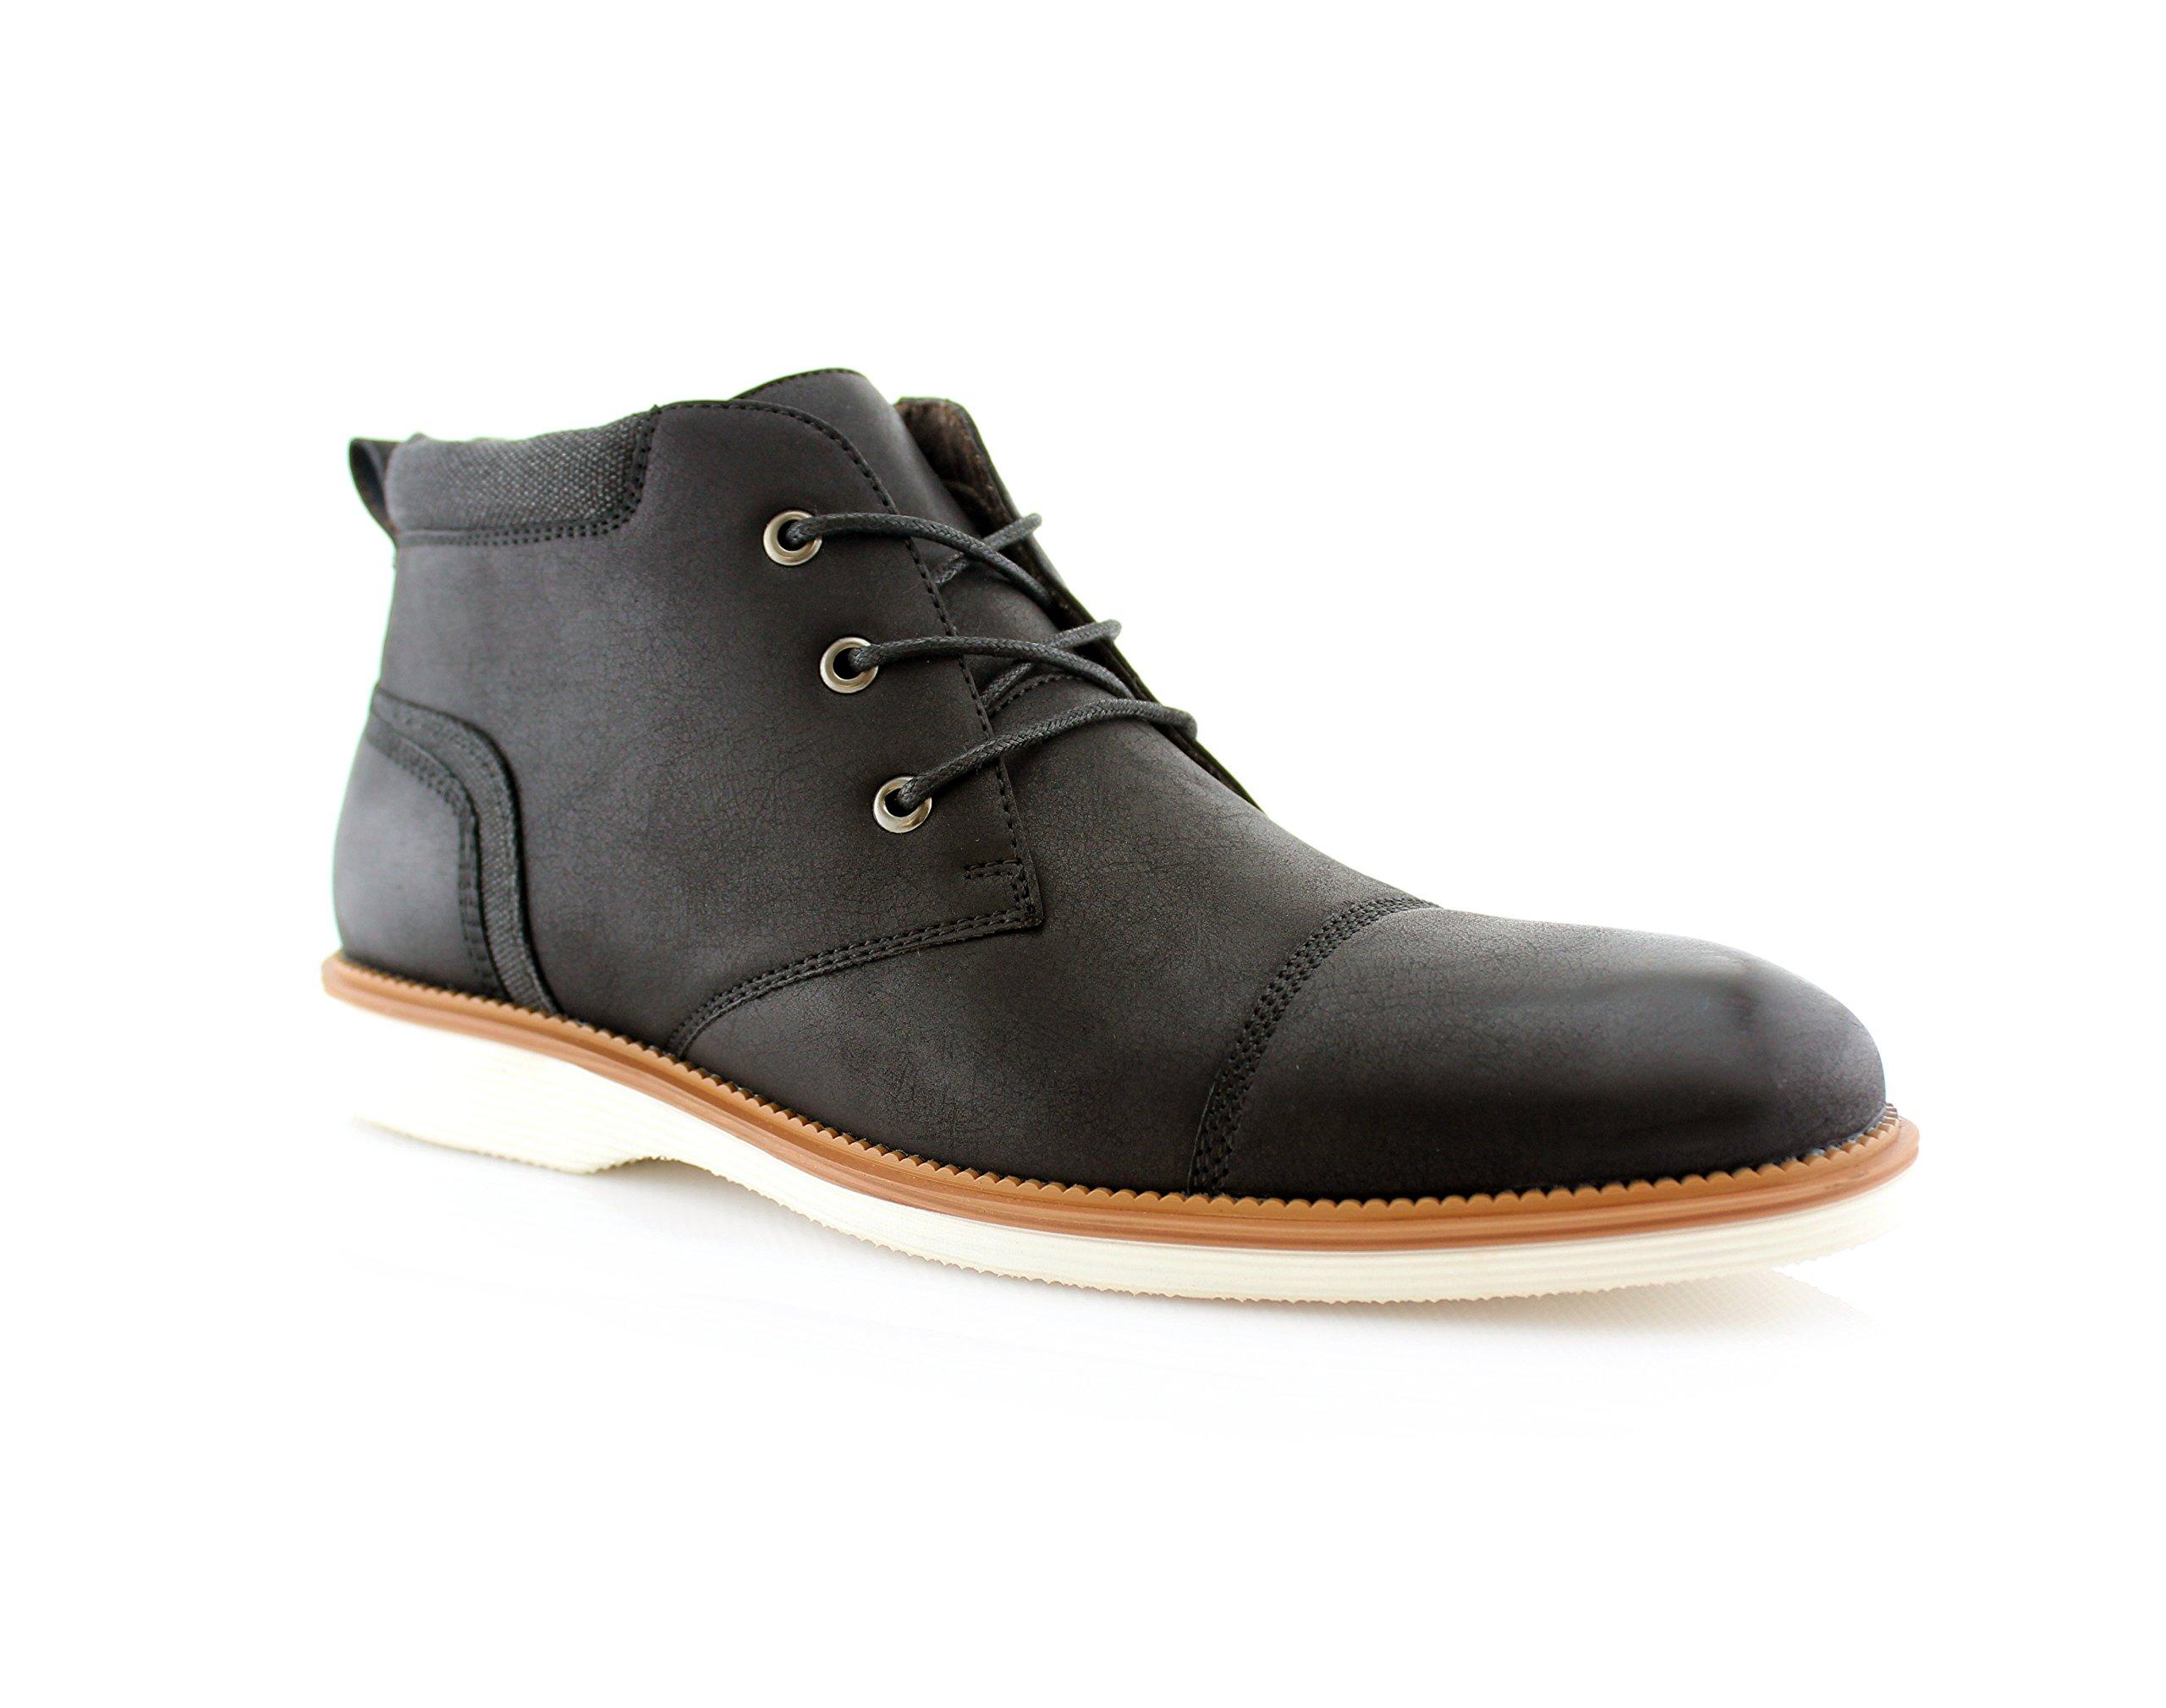 Ferro Aldo Sammy MFA506030 Mens Fashion Casual Mid-Top Sneaker Chukka Boots - Black, Size 9.5